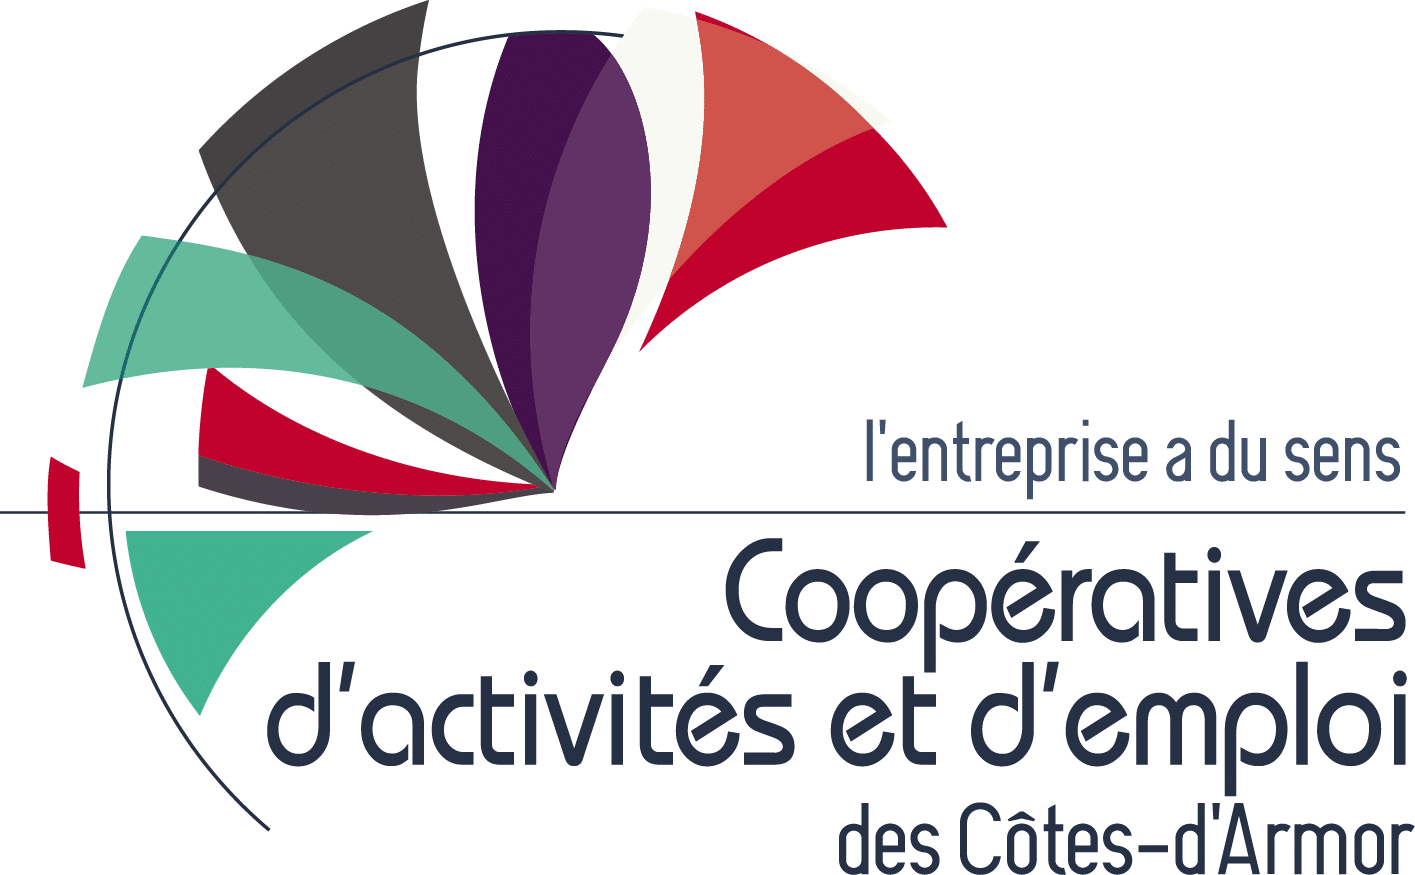 logo coopératives d'activités et d'emploi